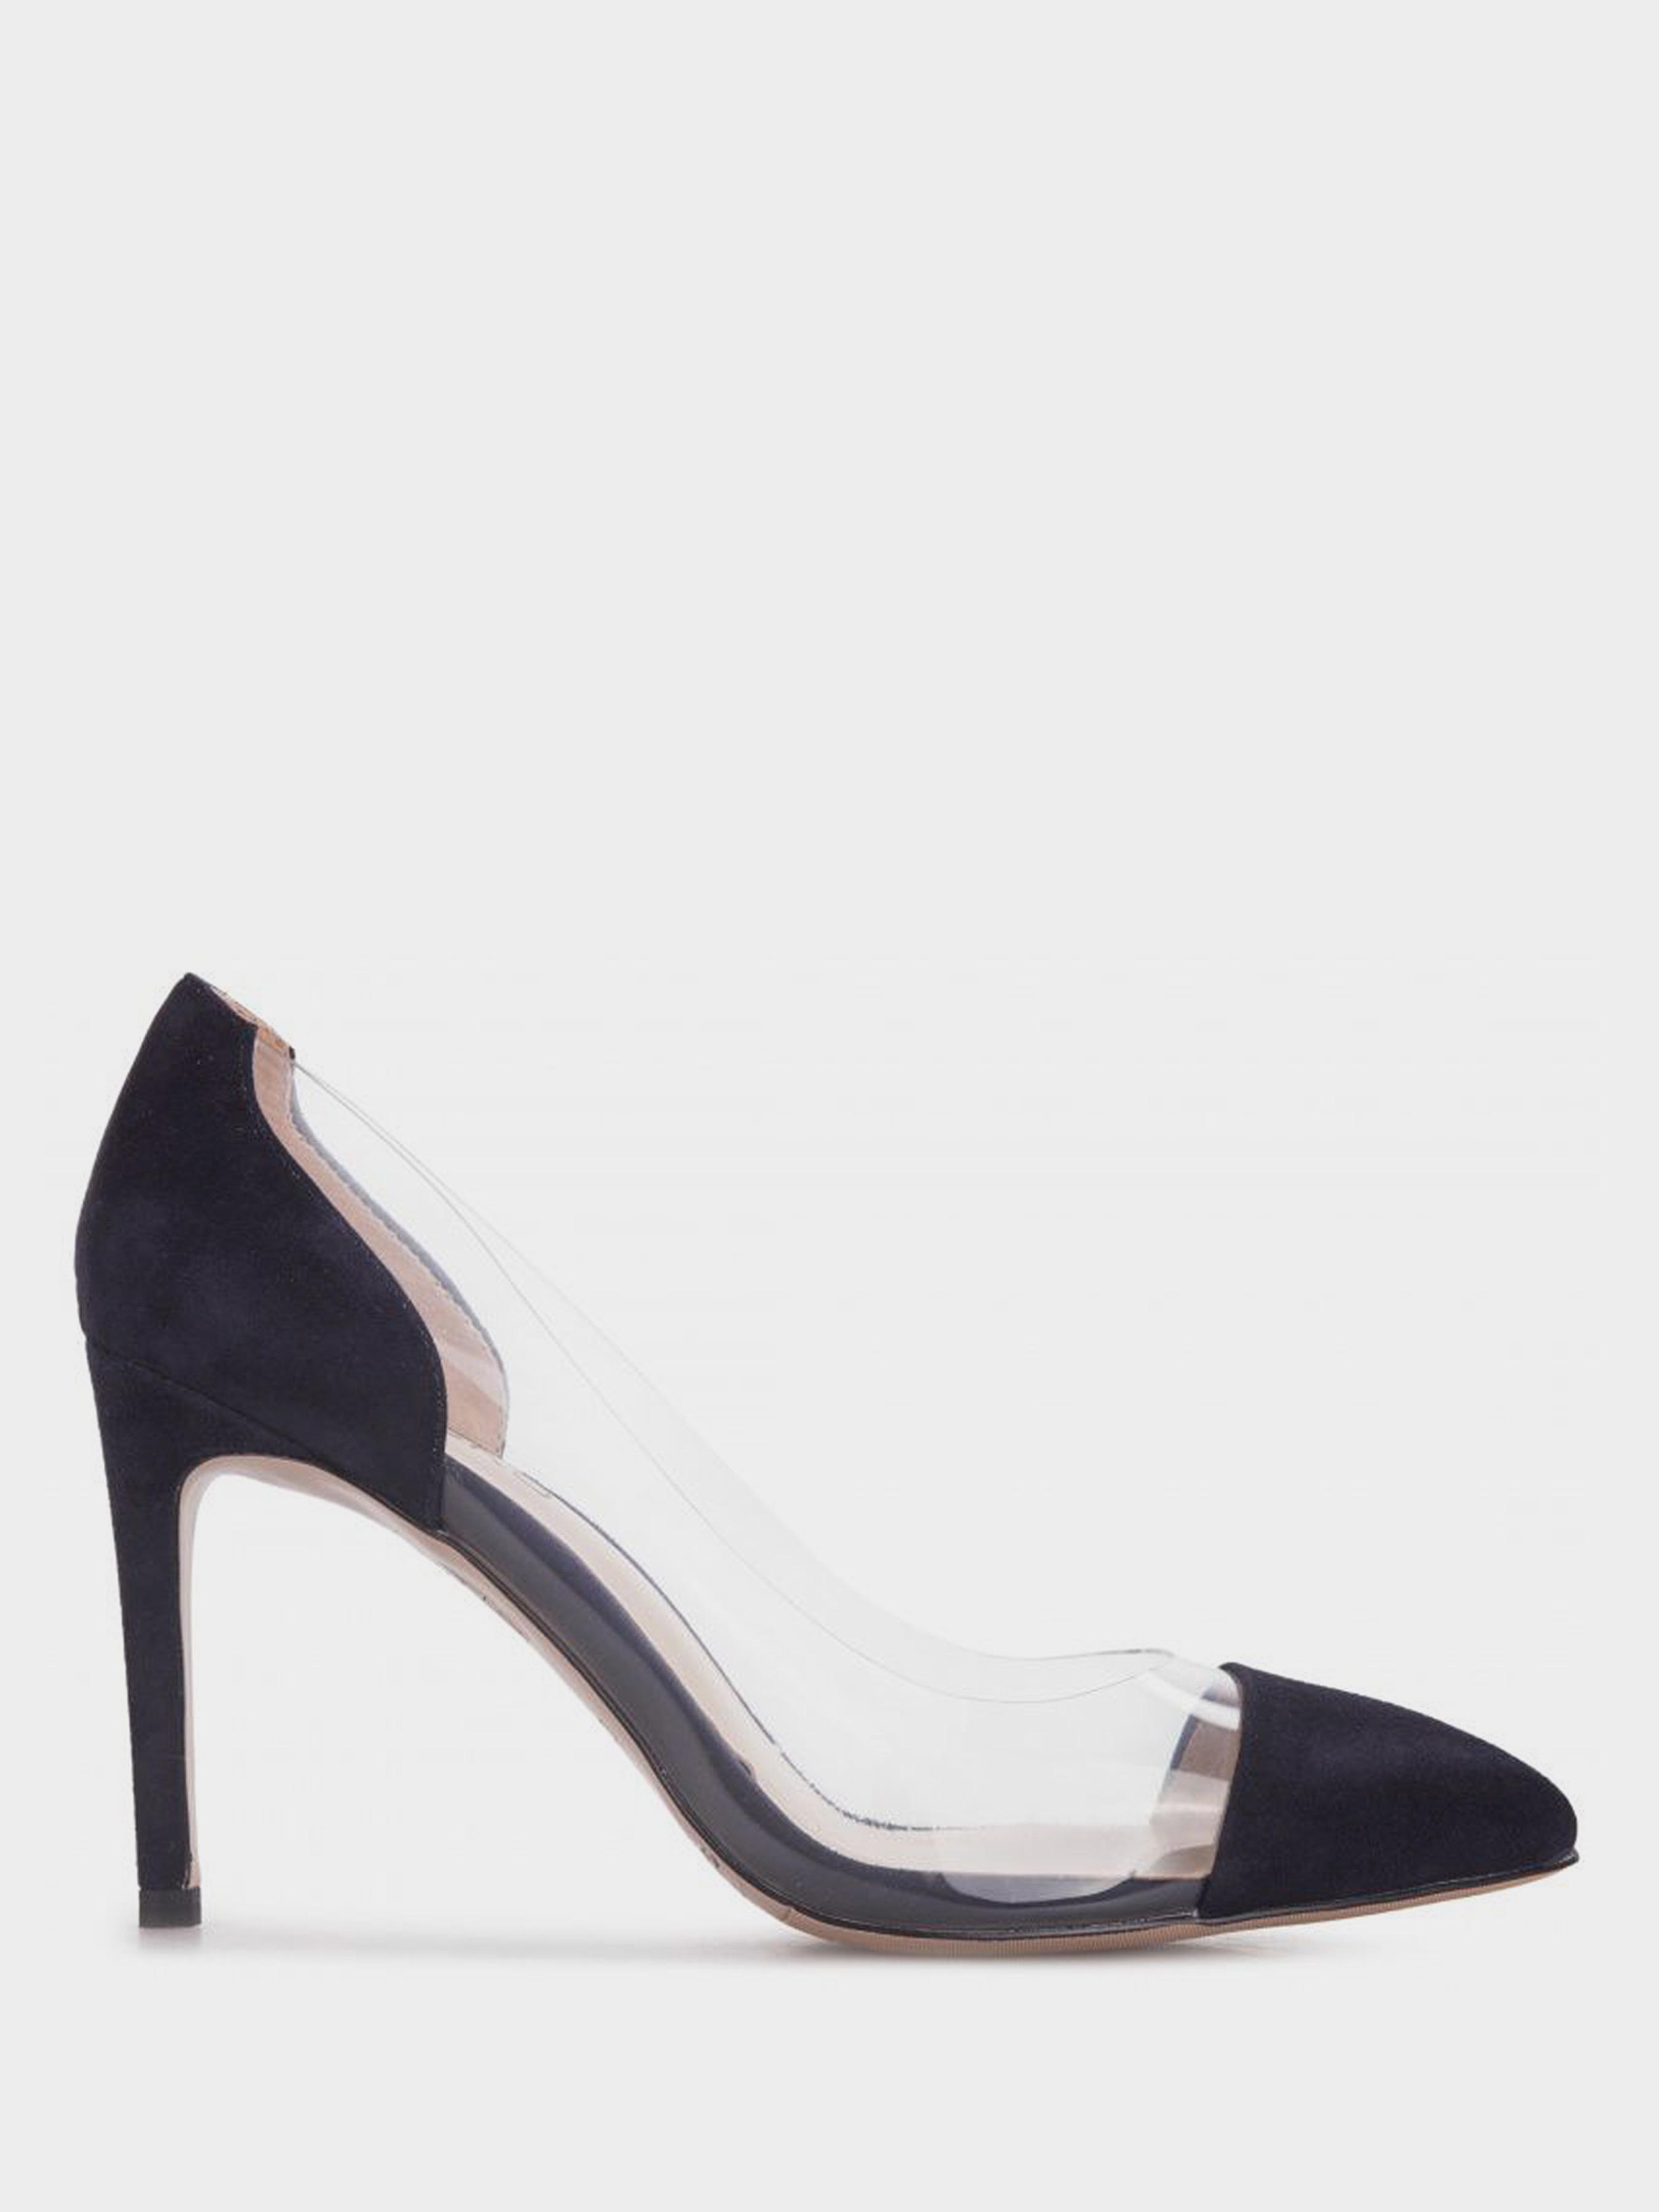 Туфли женские Braska туфлі жін.(36-41) BS3099 Заказать, 2017